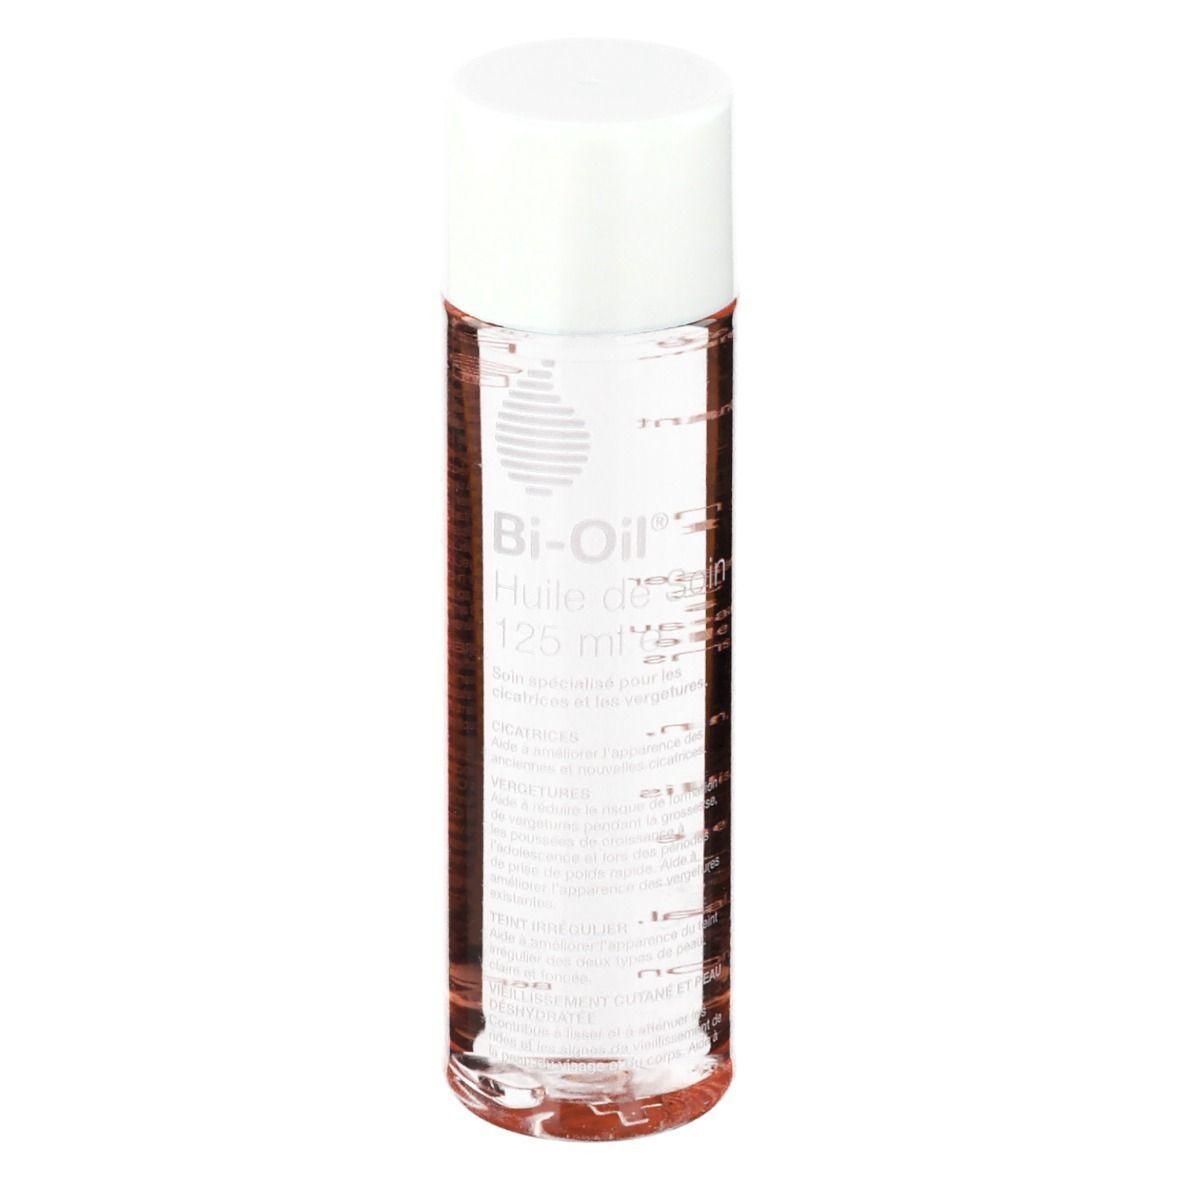 Bio-Oil Bi-Oil Huile de soin ml huile